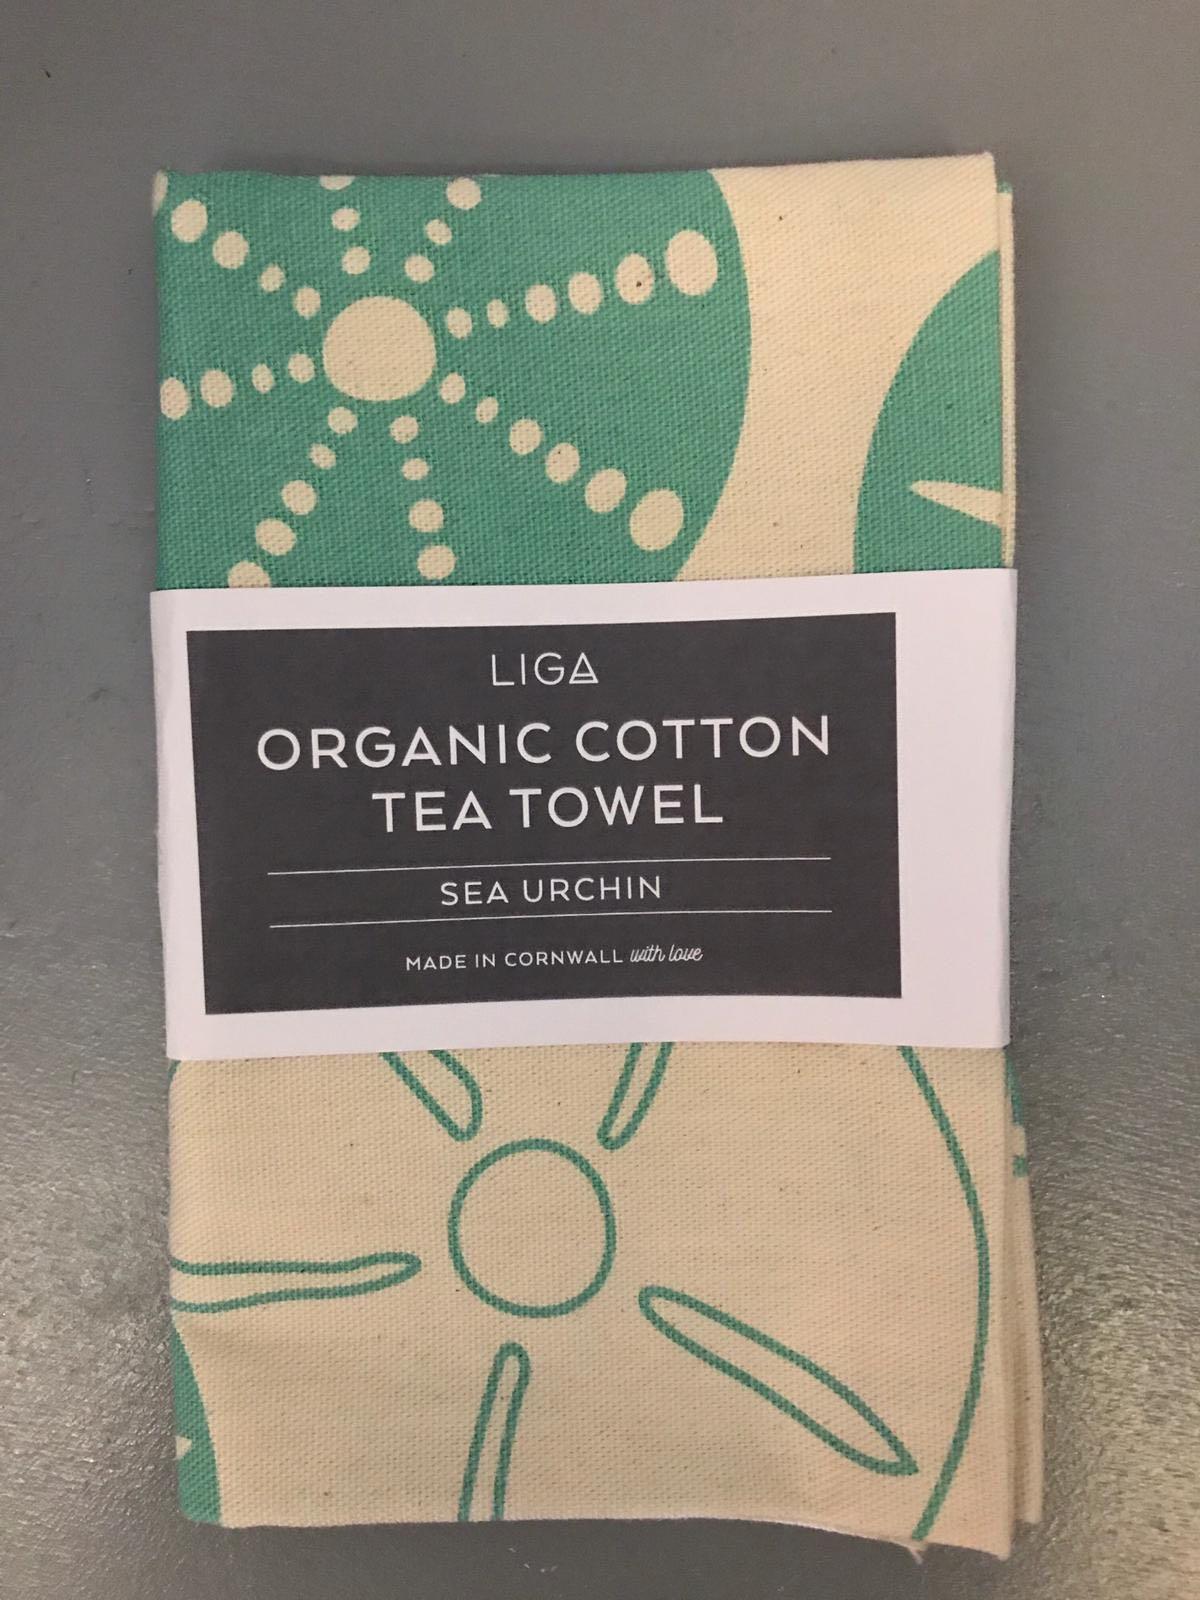 LIGA sea urchin tea towel